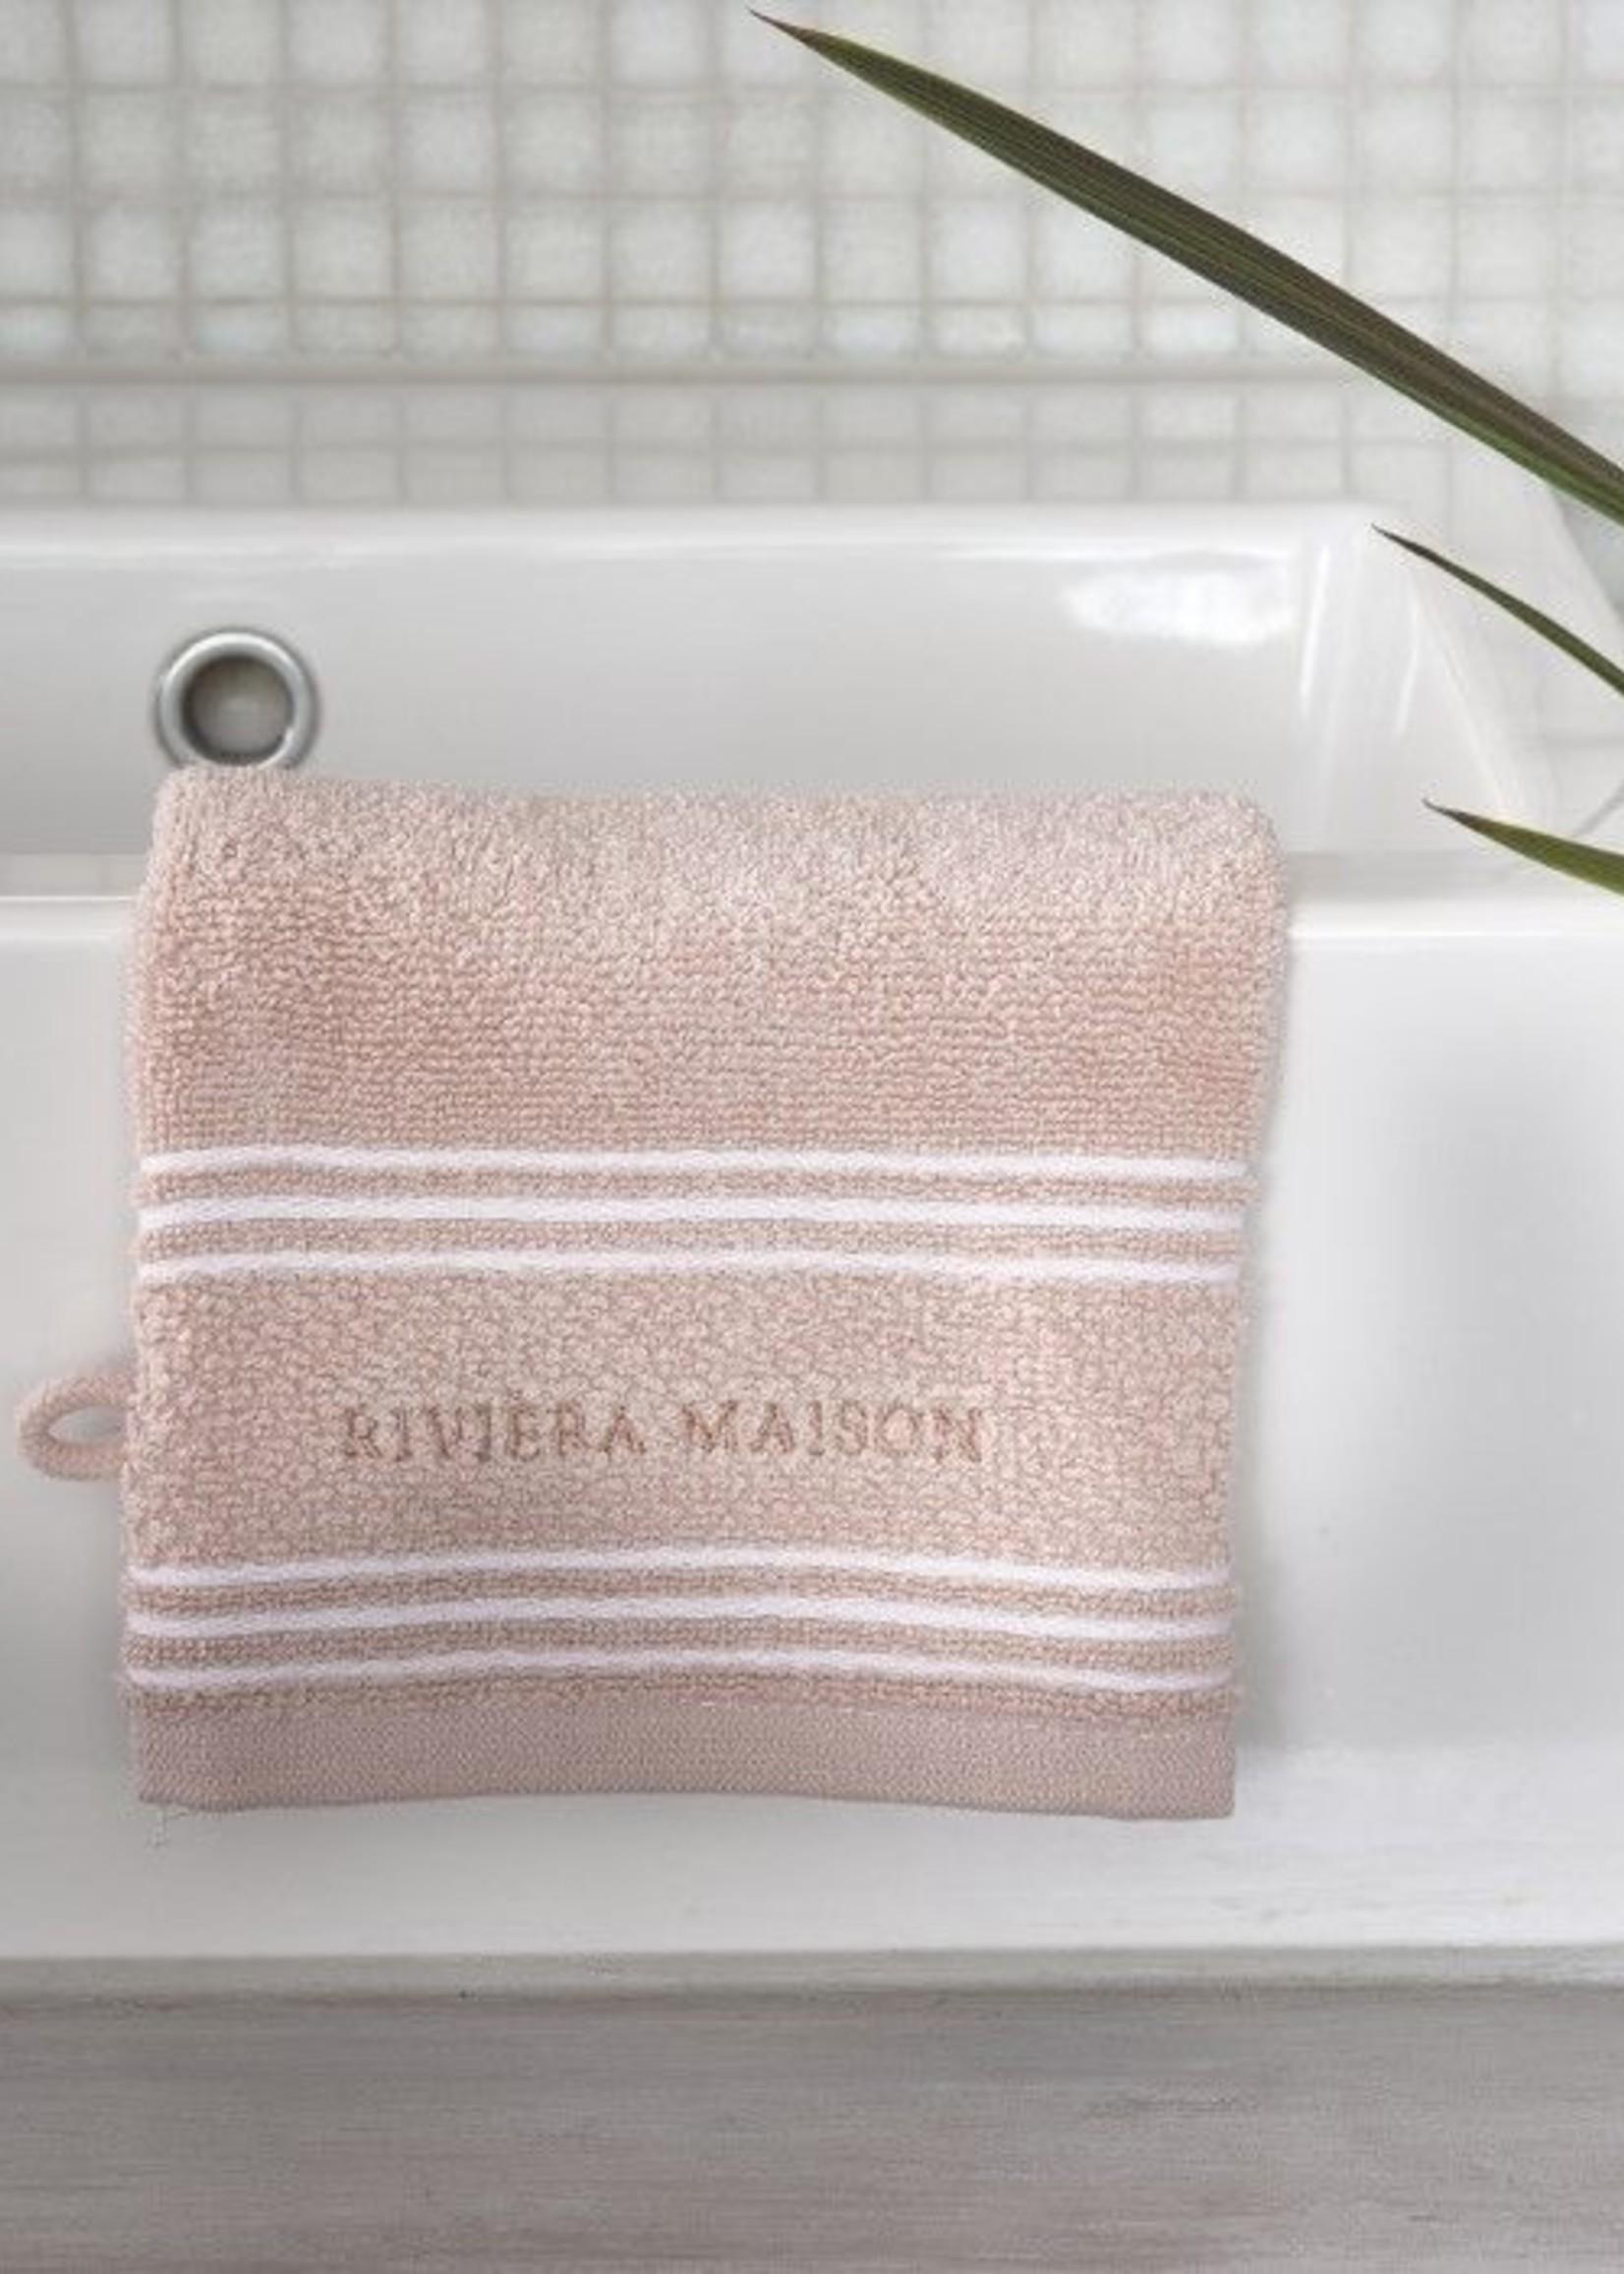 Riviera Maison Serene Washcloth blossom